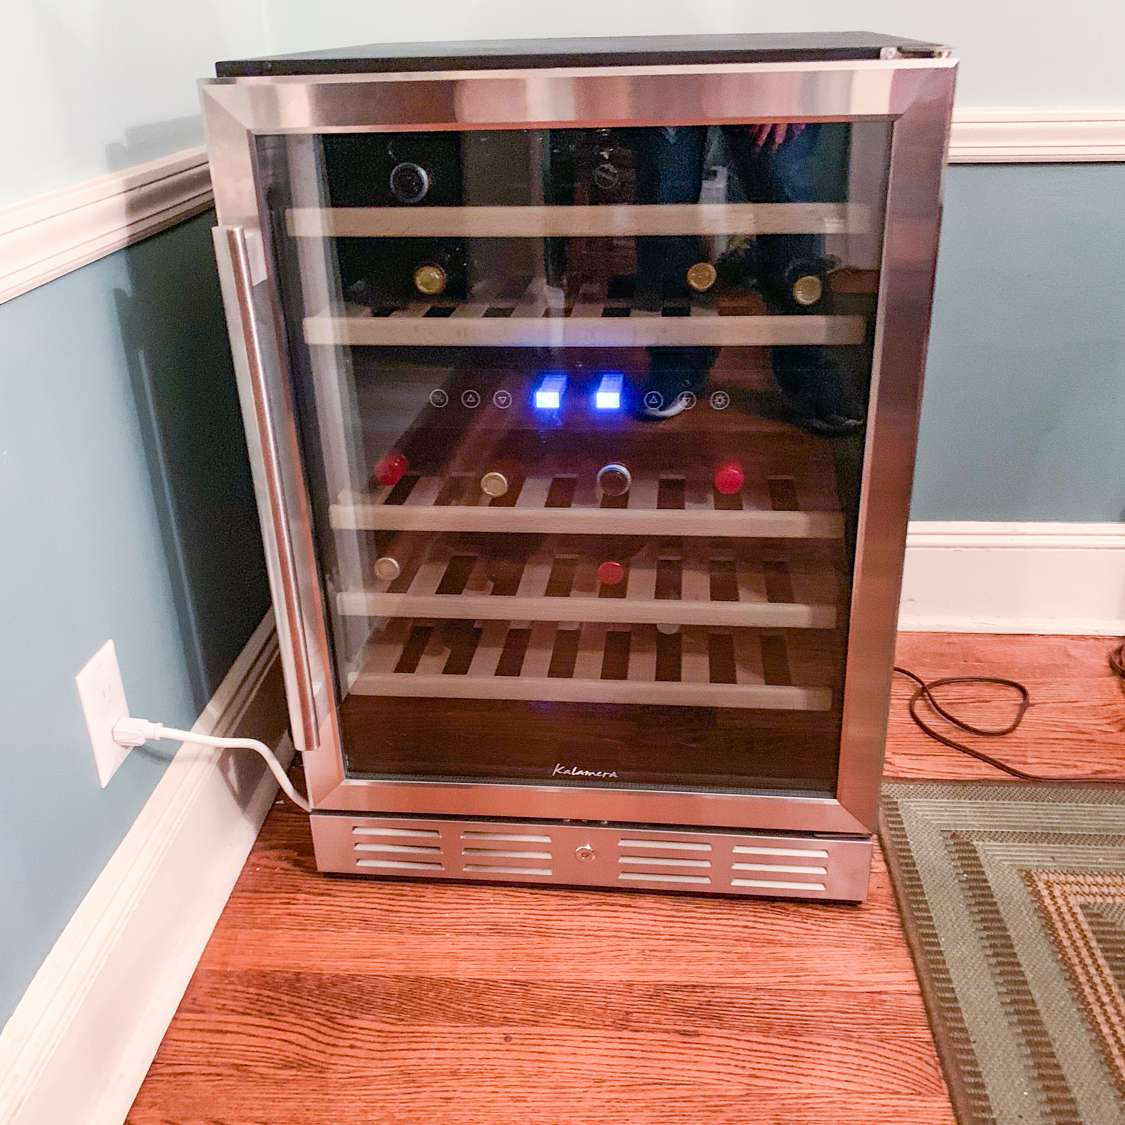 Kalamera 24 Wine Refrigerator